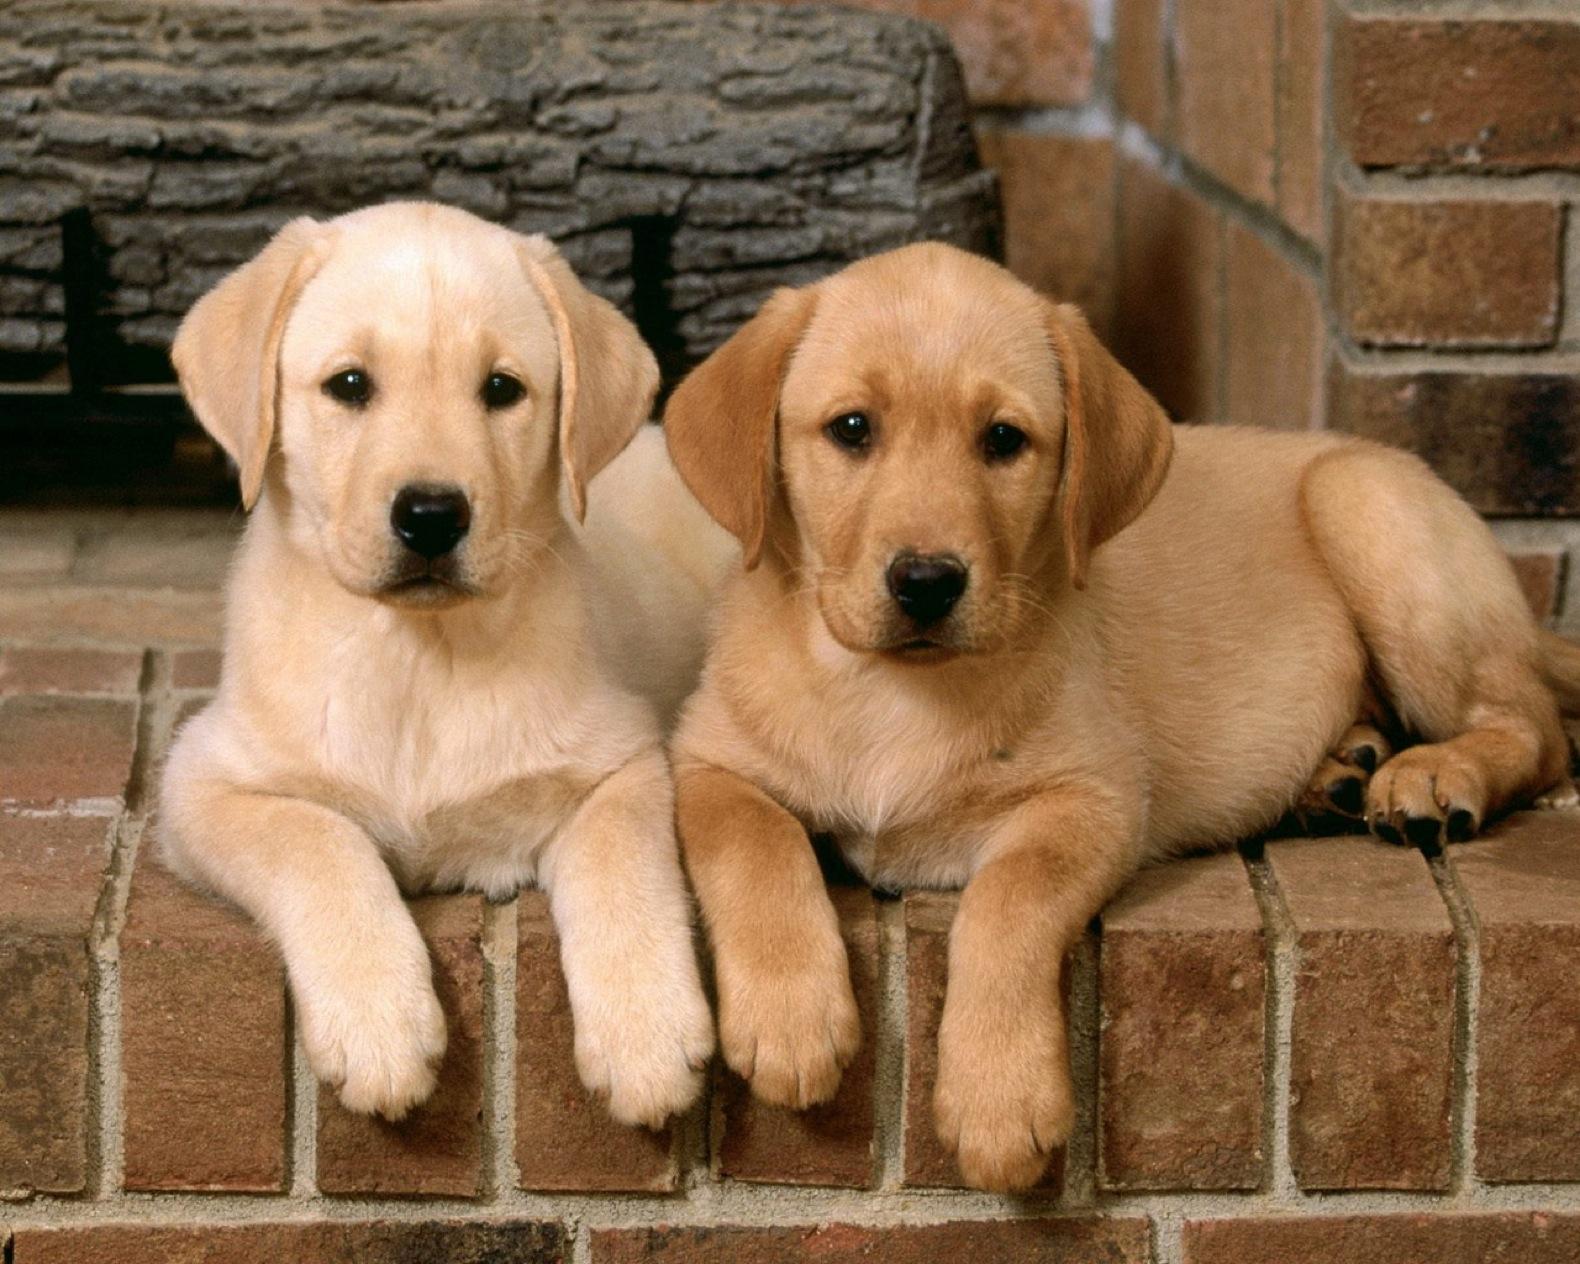 Картинки с собаками картинки с собаками, картинки